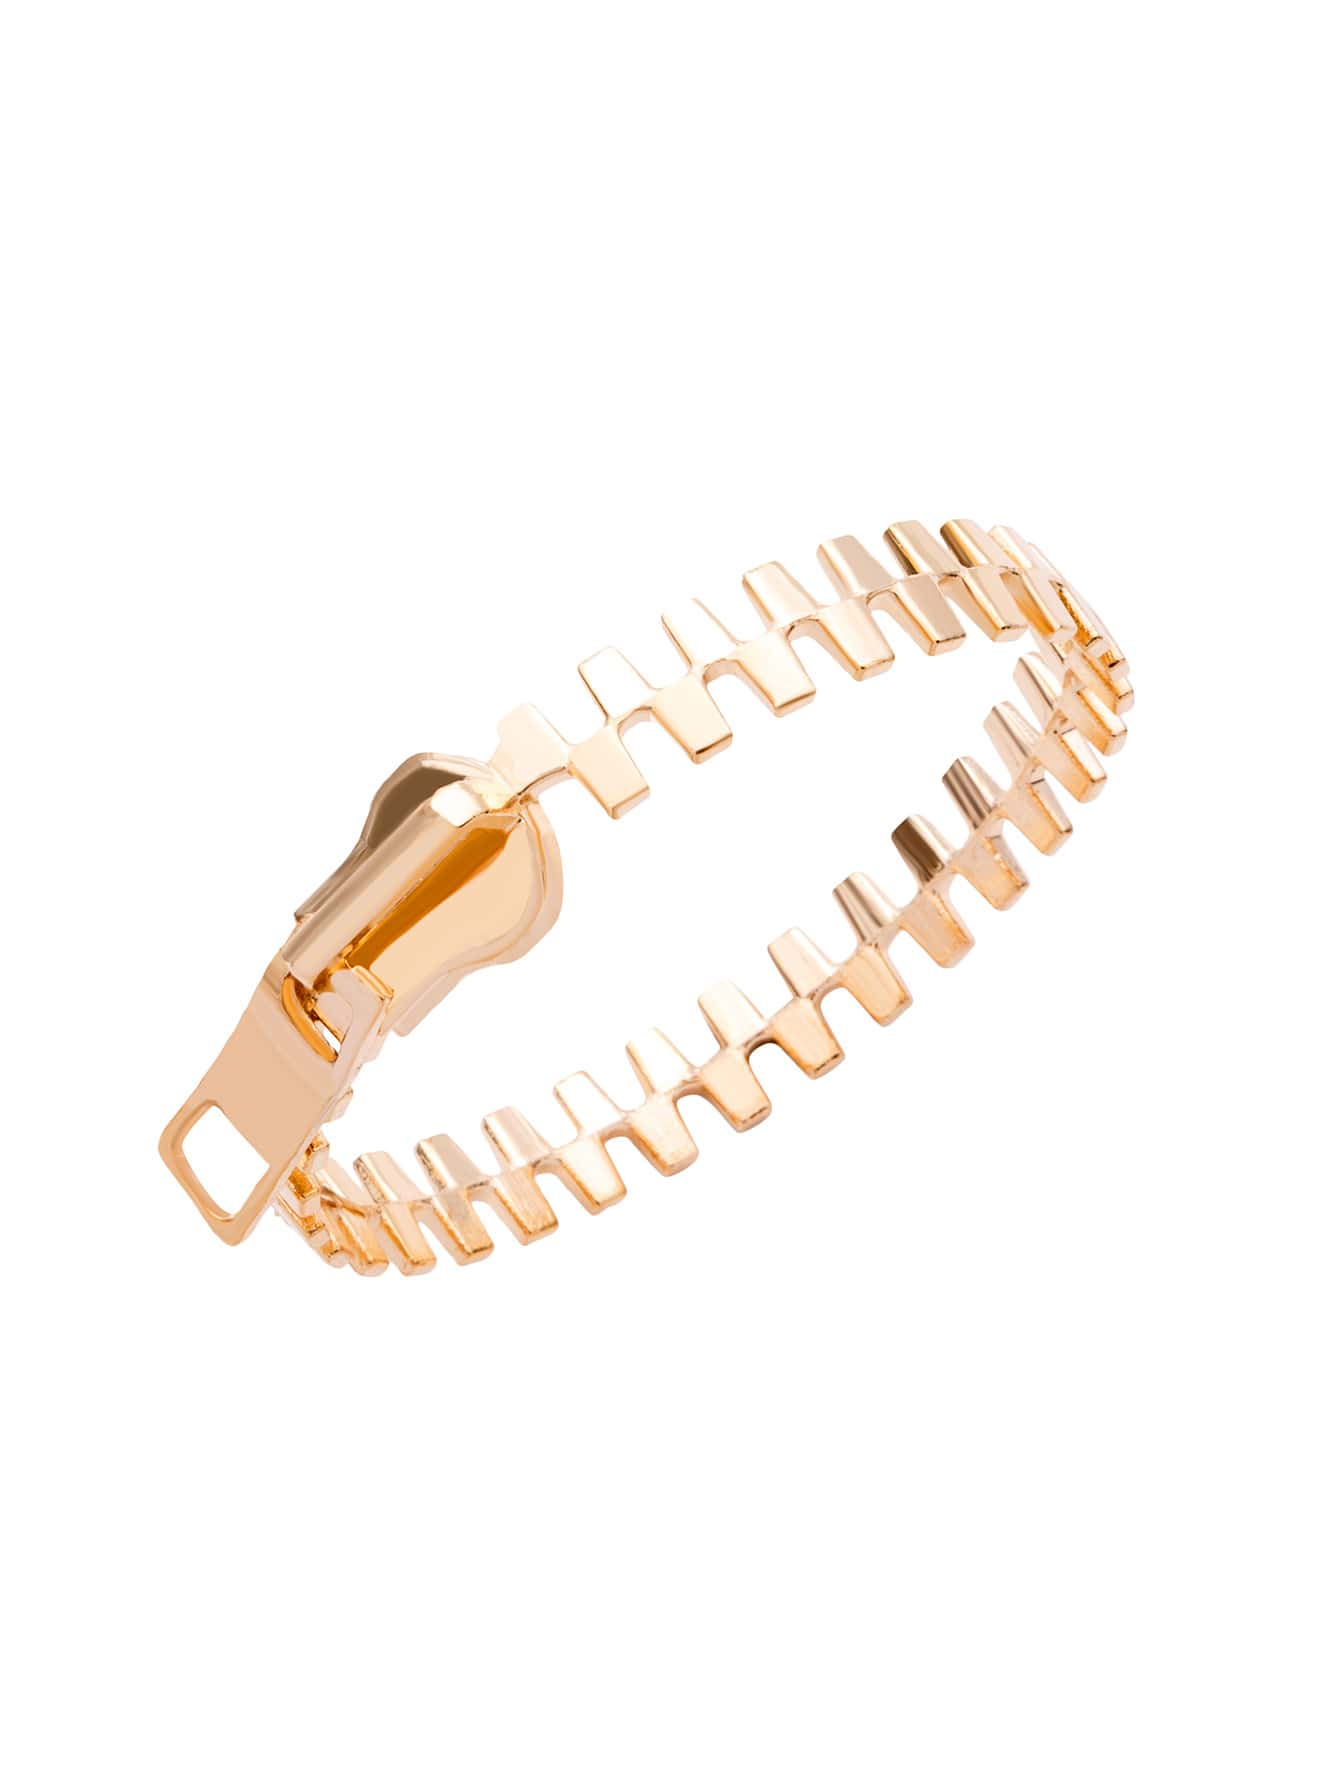 Gold Plated Zipper Design BangleGold Plated Zipper Design Bangle<br><br>color: Gold<br>size: None